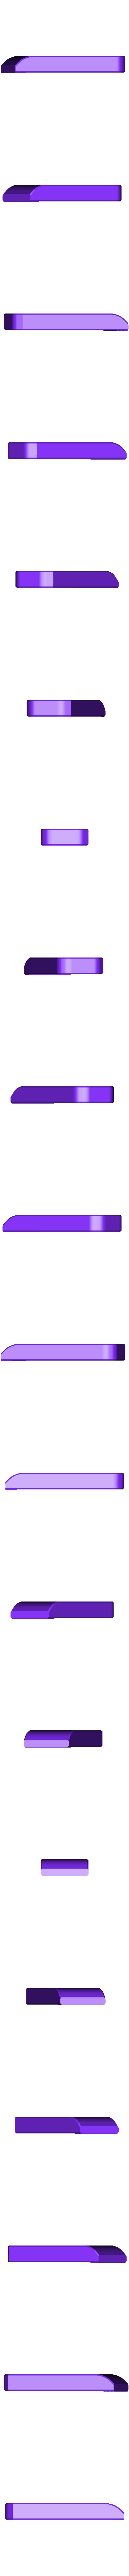 clamp.stl Download free STL file CNC 3018 Clamp set • 3D printing object, Sagittario